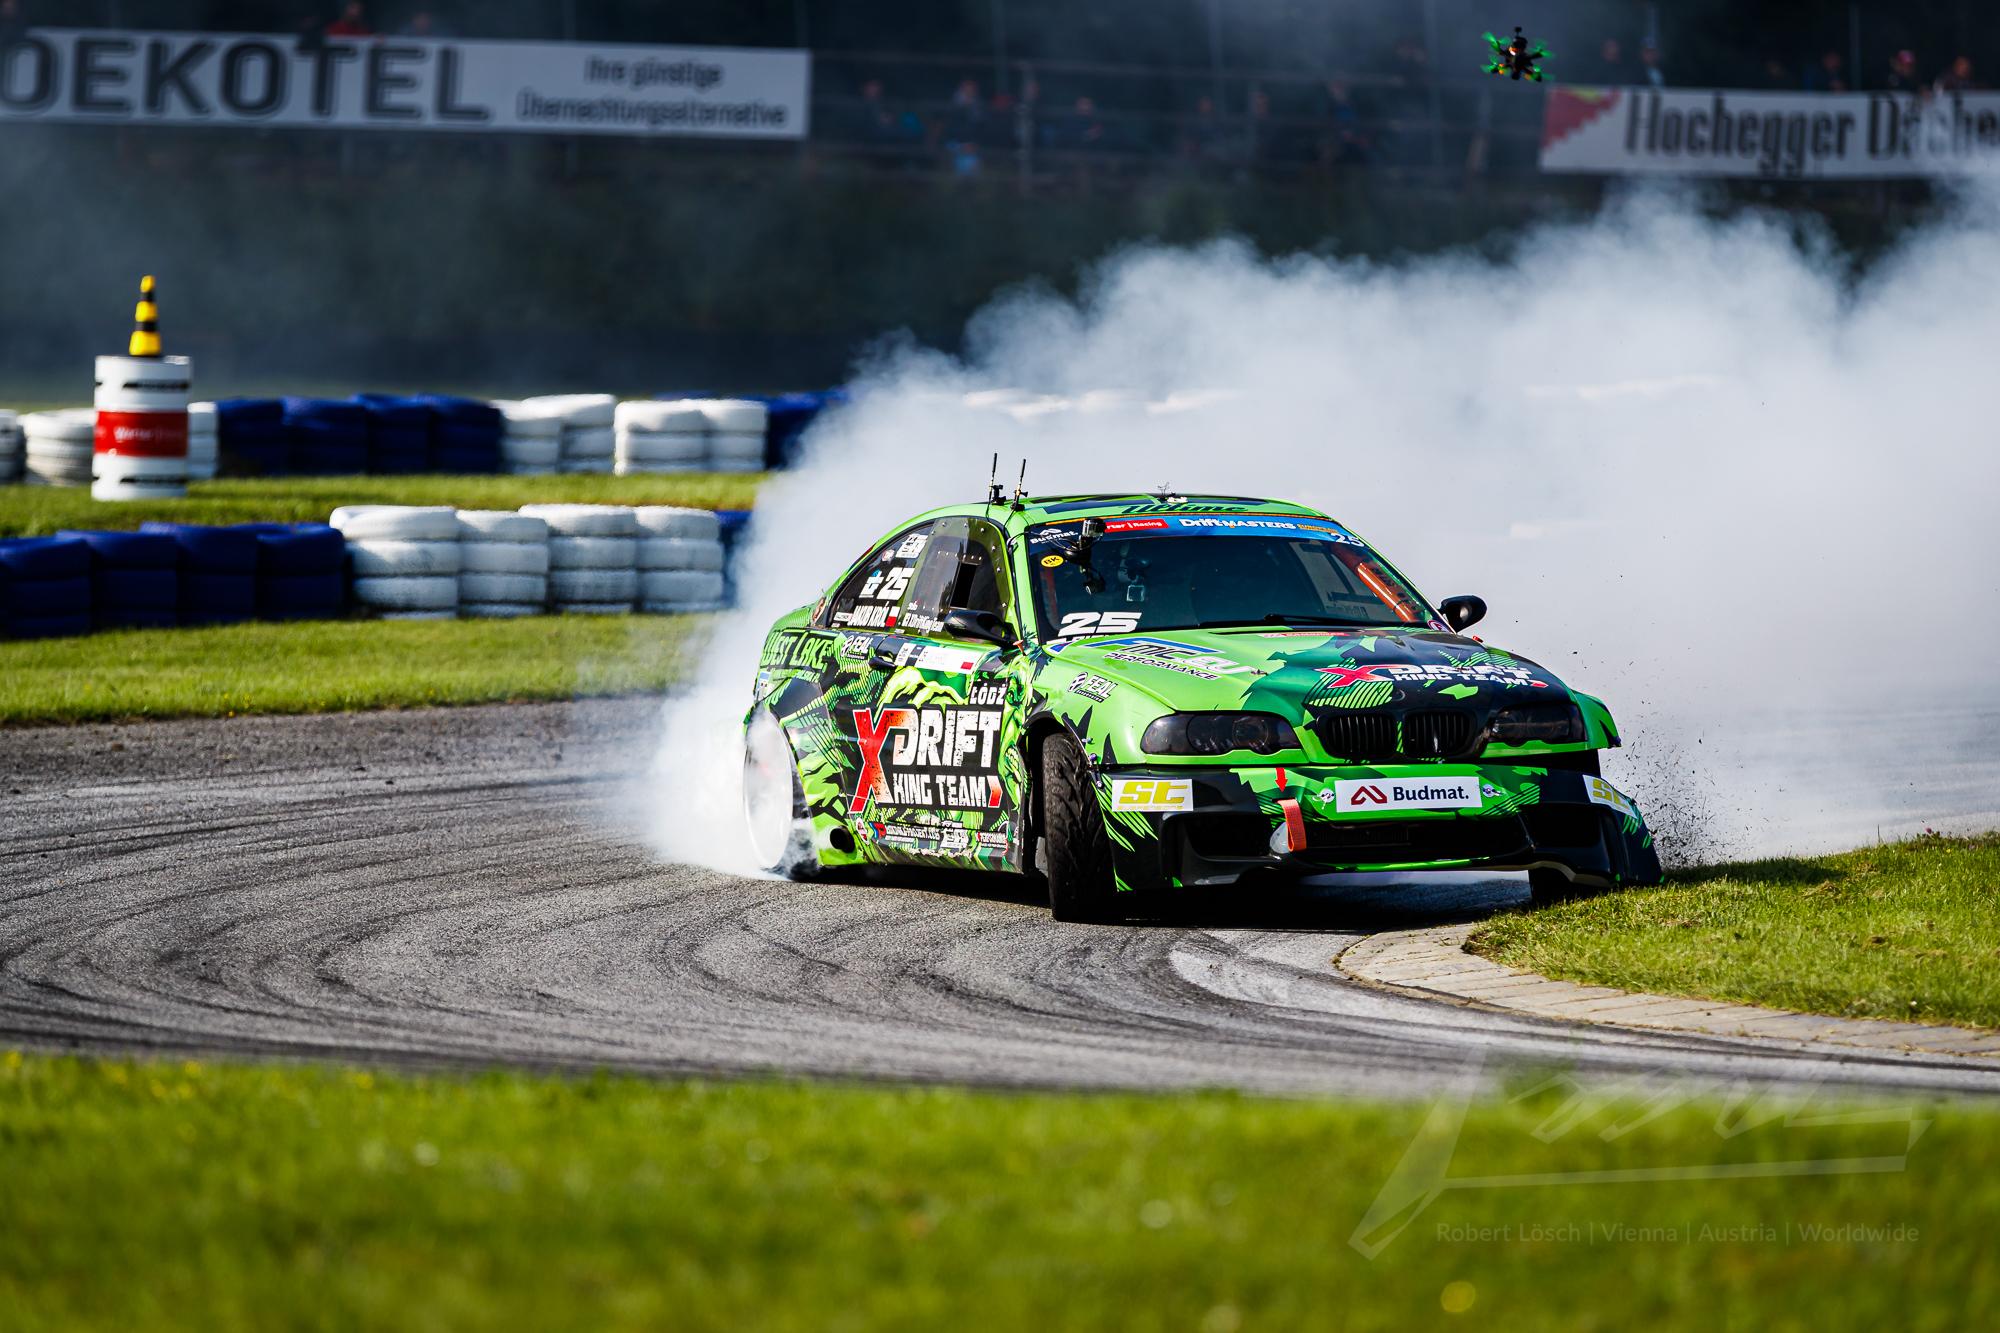 Driftmasters-GP-Greinbach-2019-30